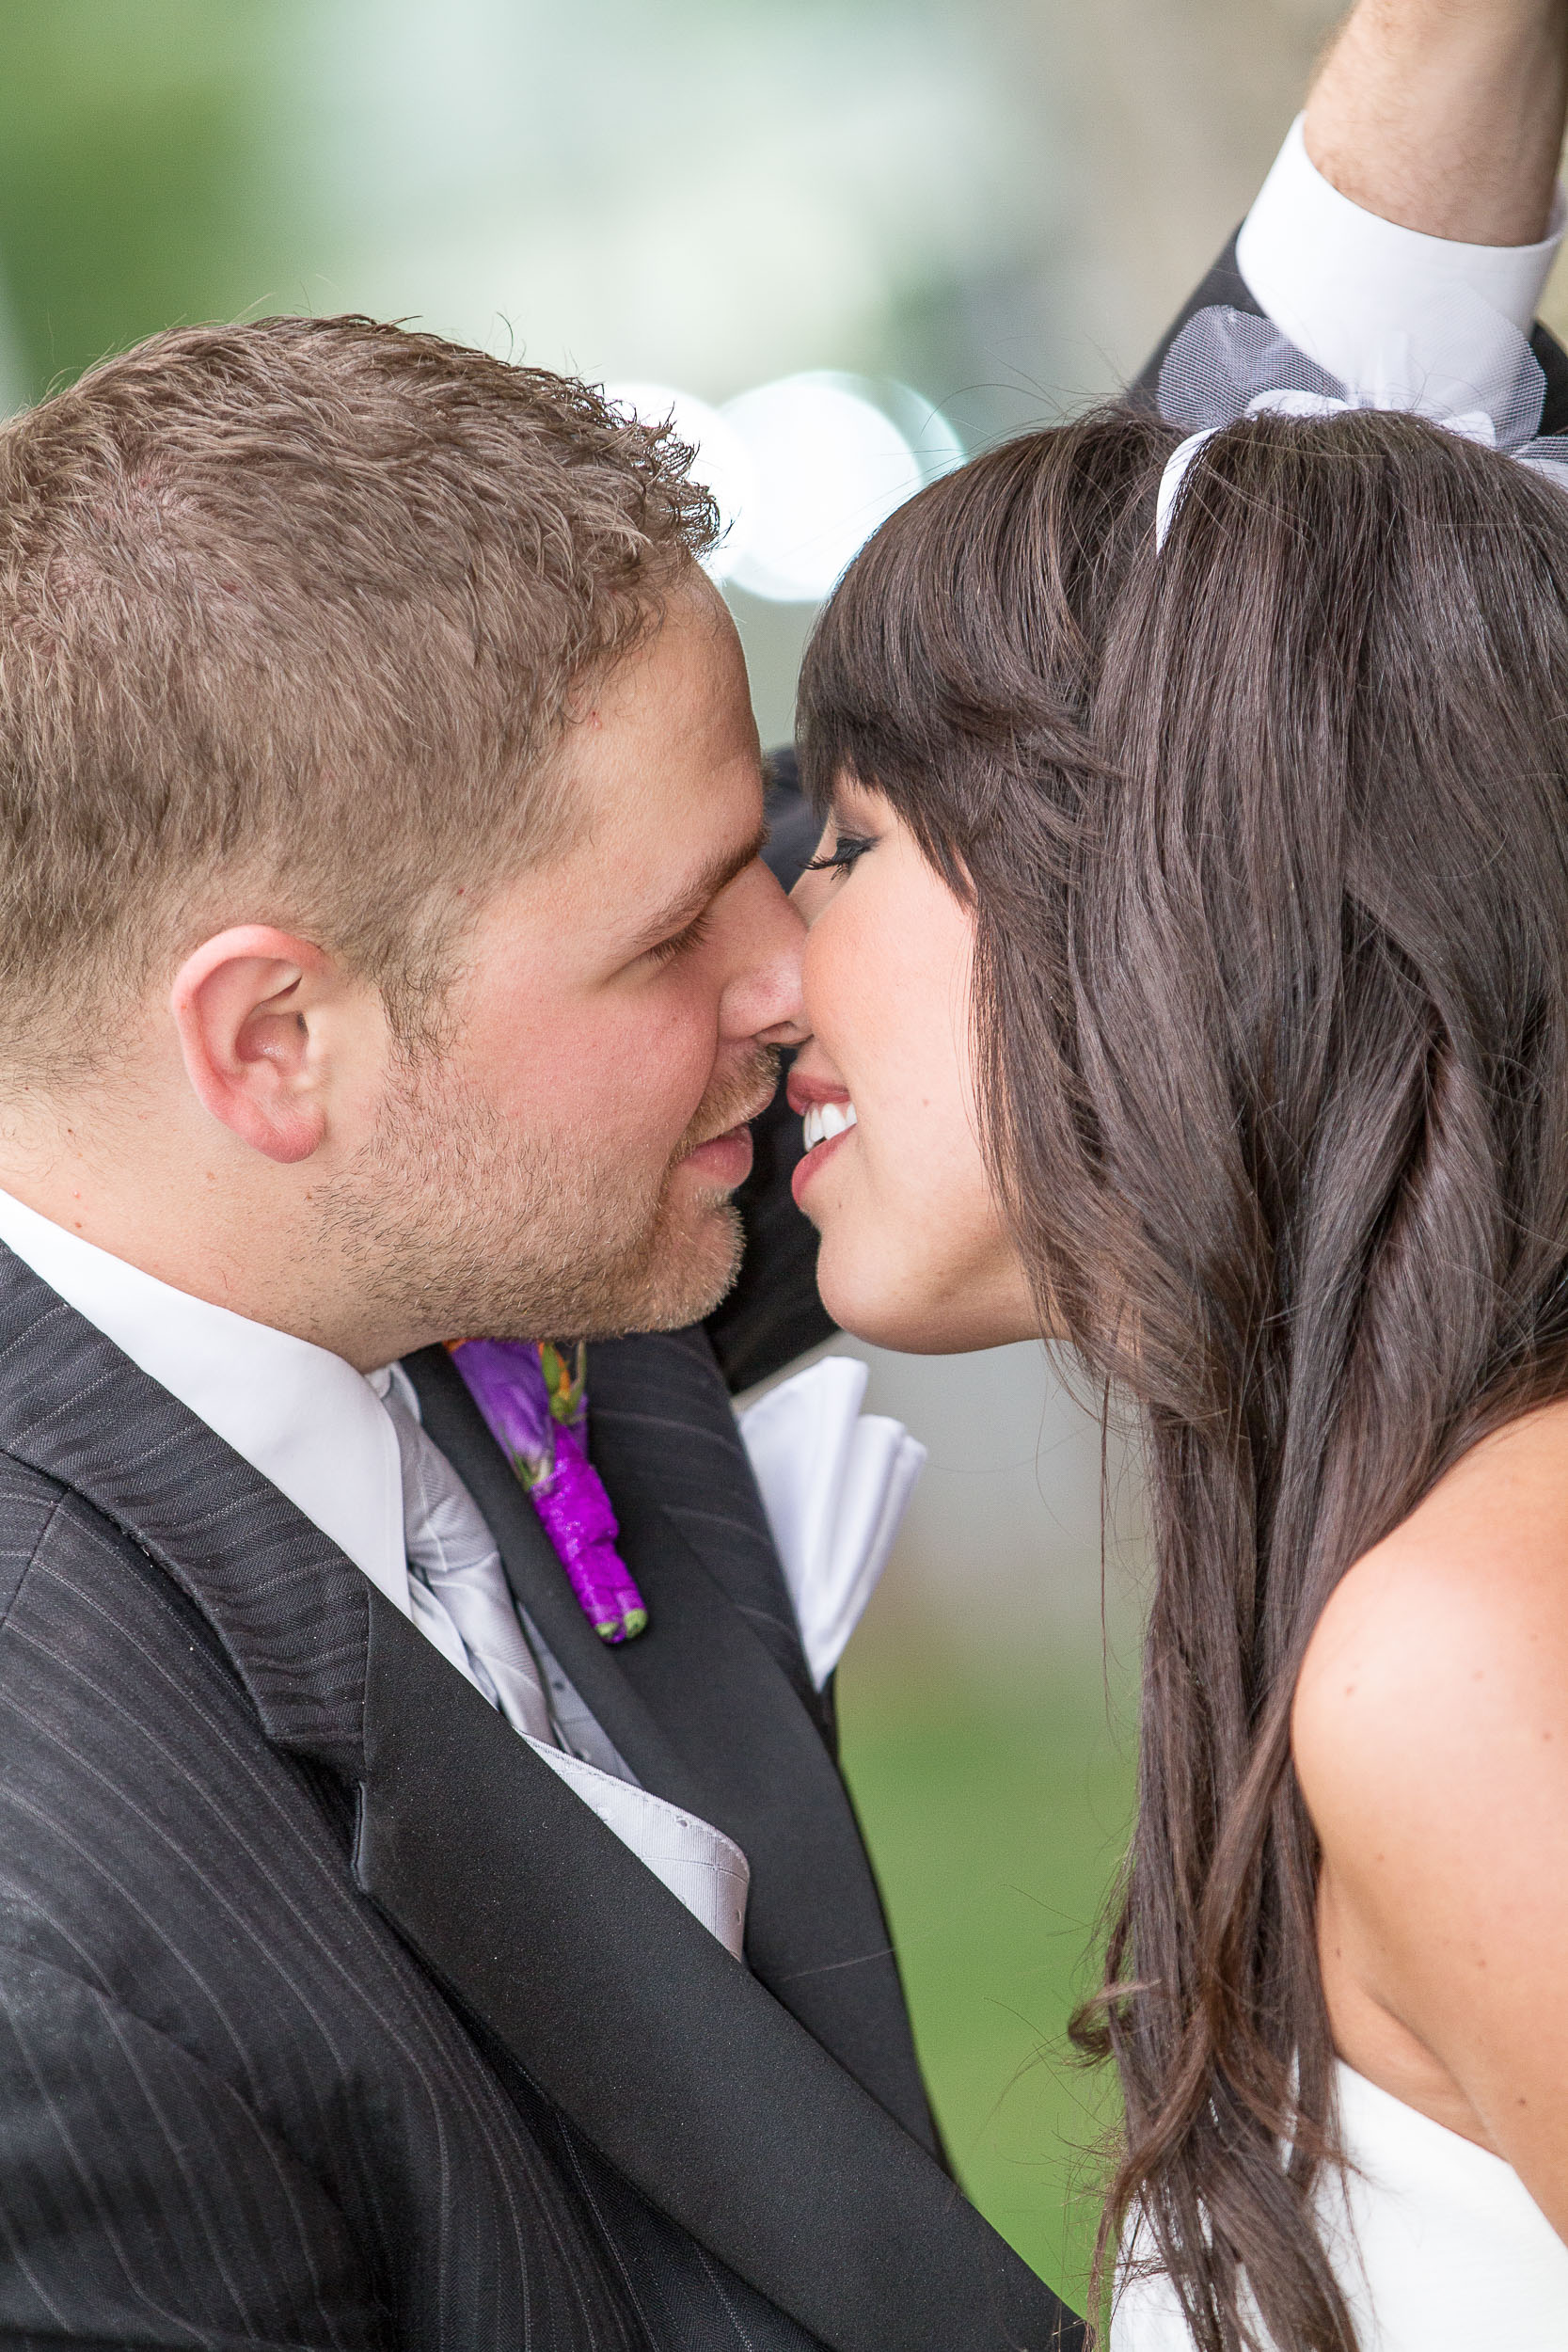 FumioWeddings - Real Weddings mixed-27.jpg